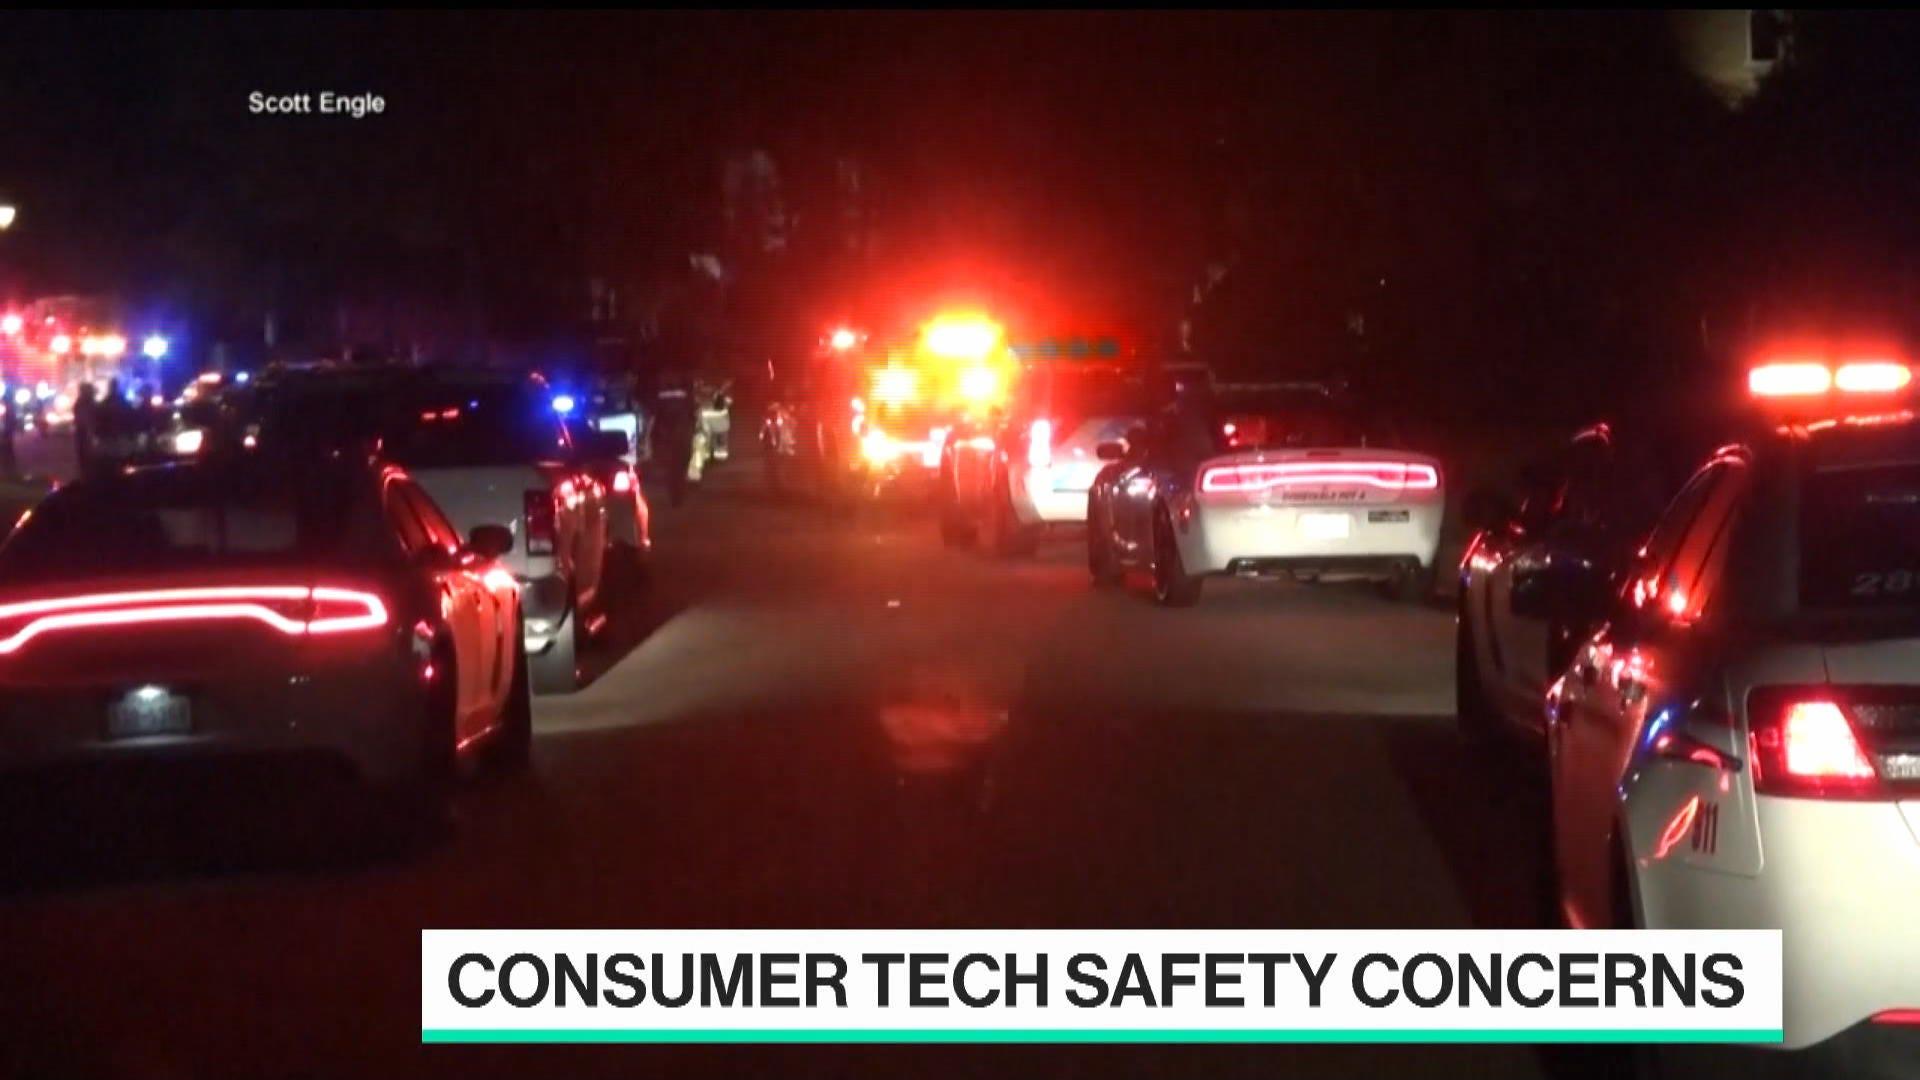 Tesla CEO Elon Musk defends Autopilot after deadly Model S Texas crash